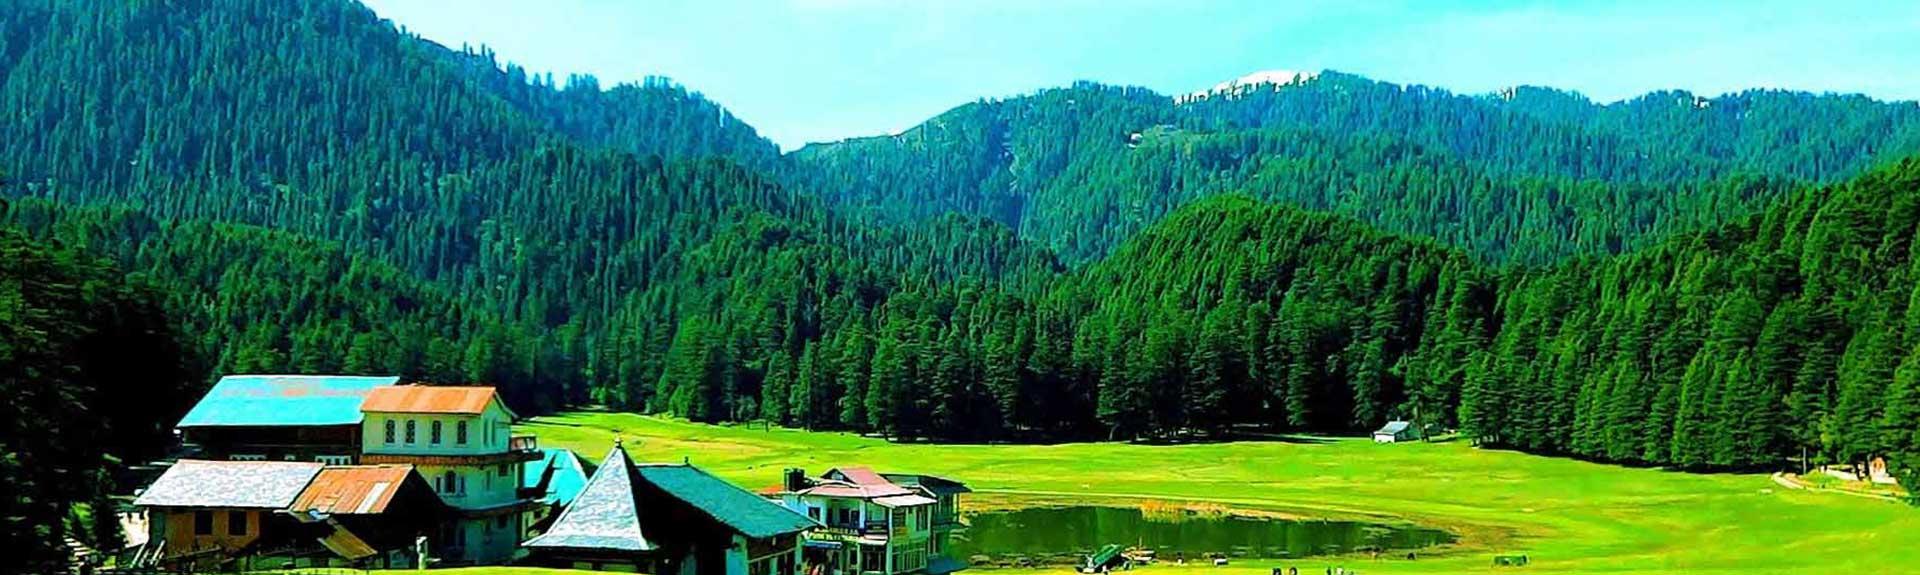 Khajjiar - Tourism Spot in India